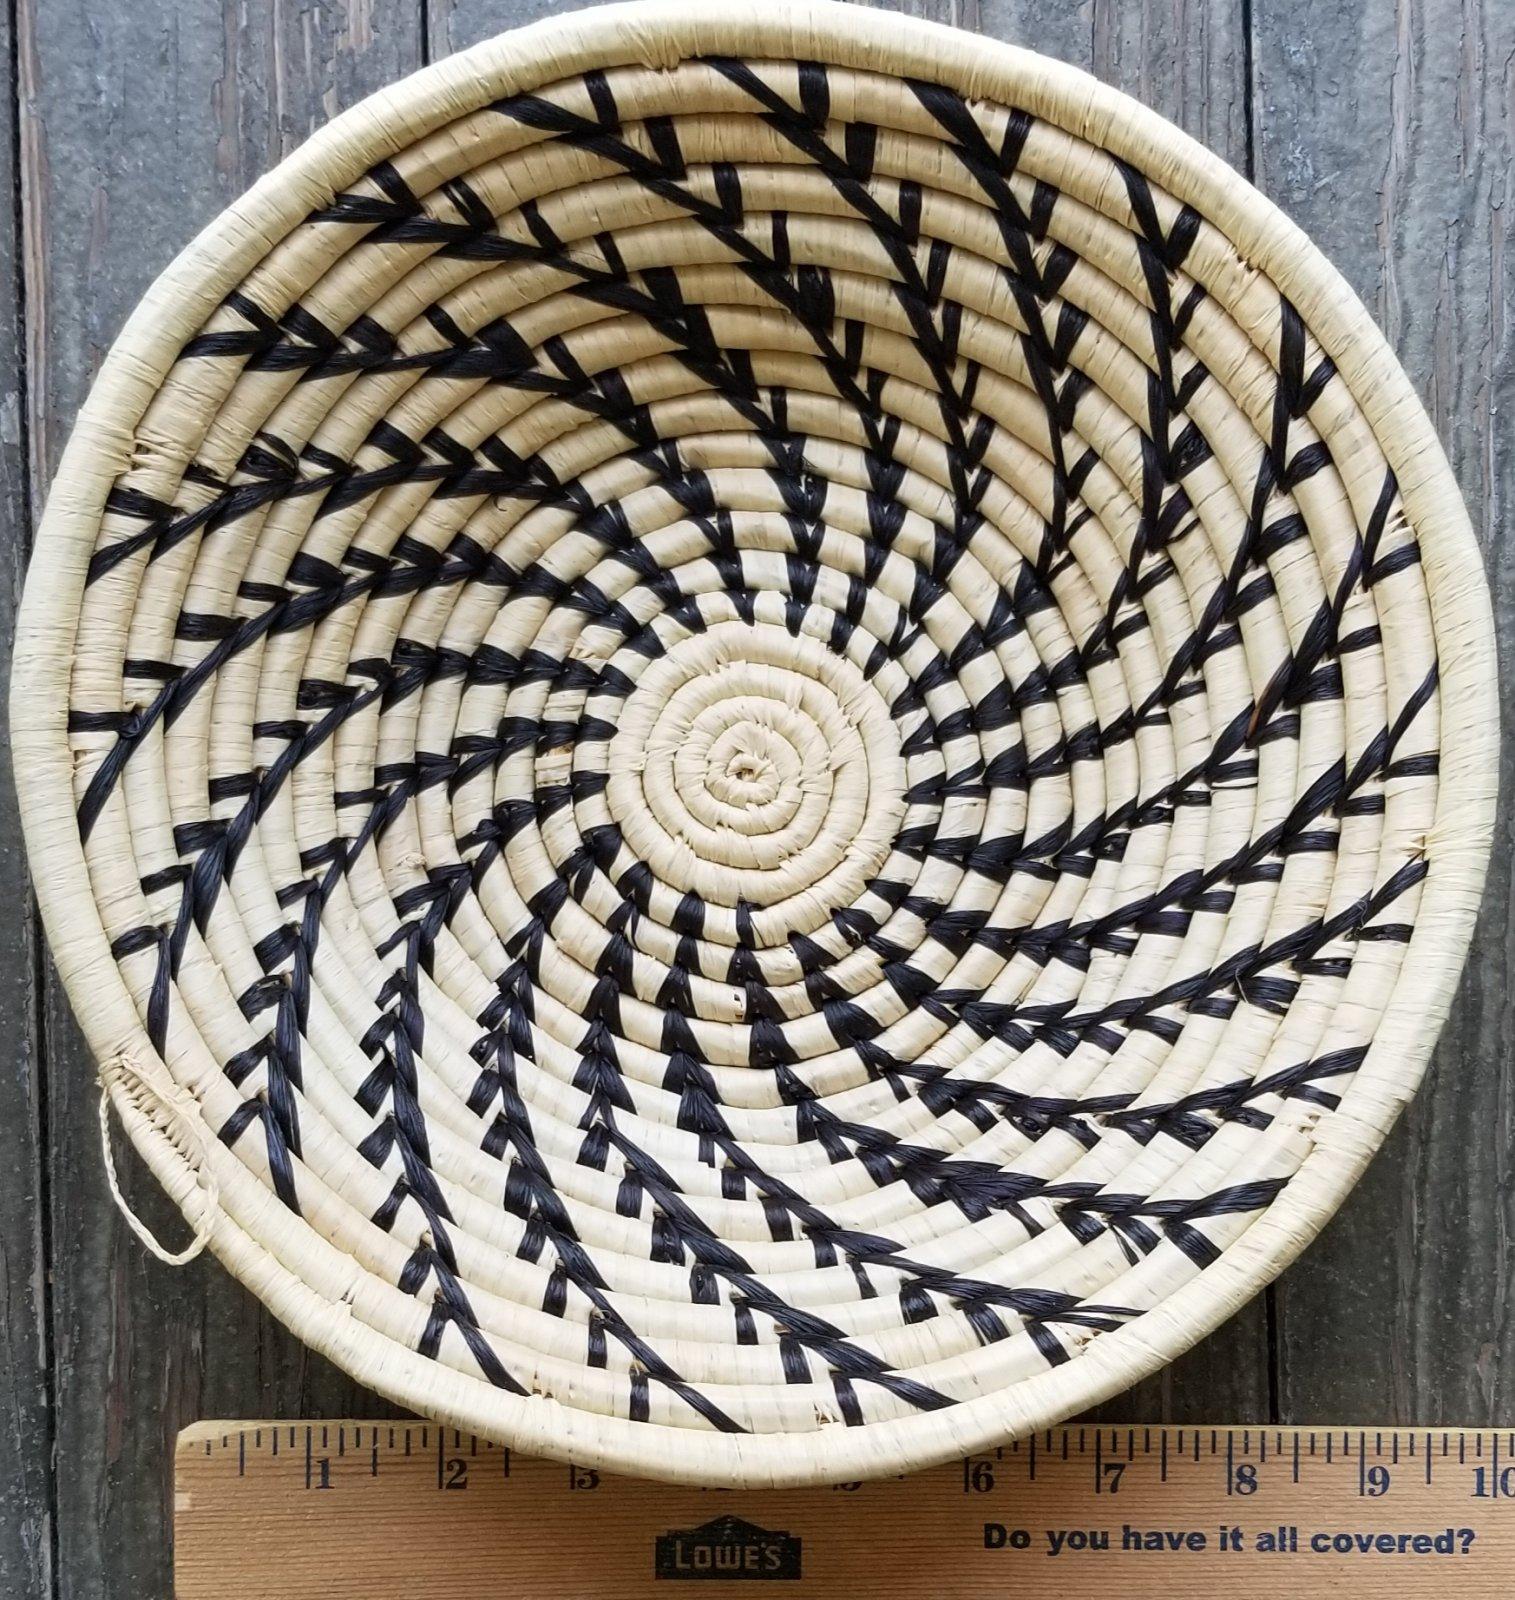 10 Uganda Basket With Black Stripes #011